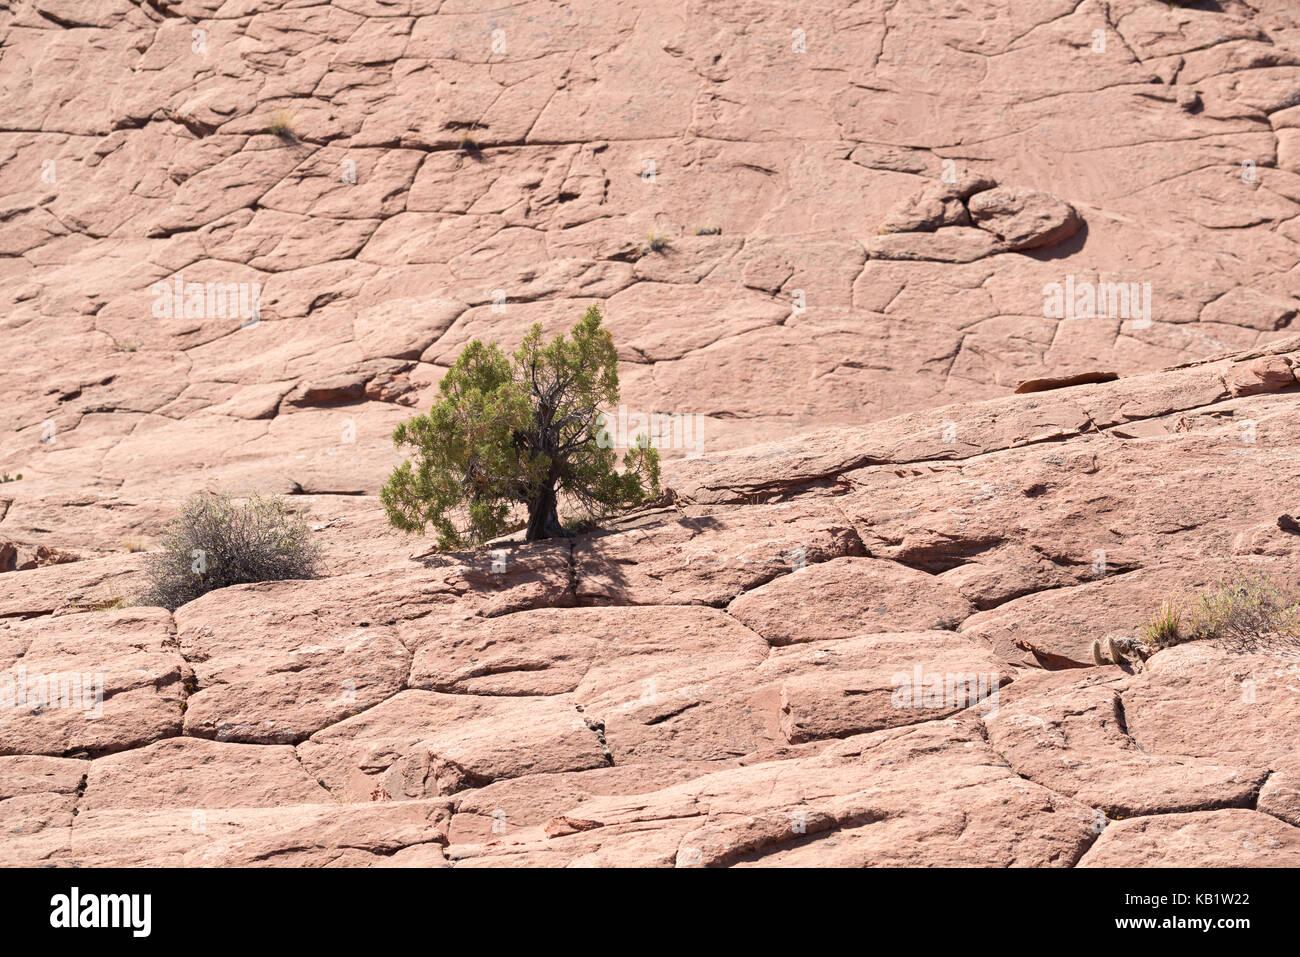 Juniper tree growing in slickrock, Grand Staircase - Escalante National Monument, Utah. - Stock Image